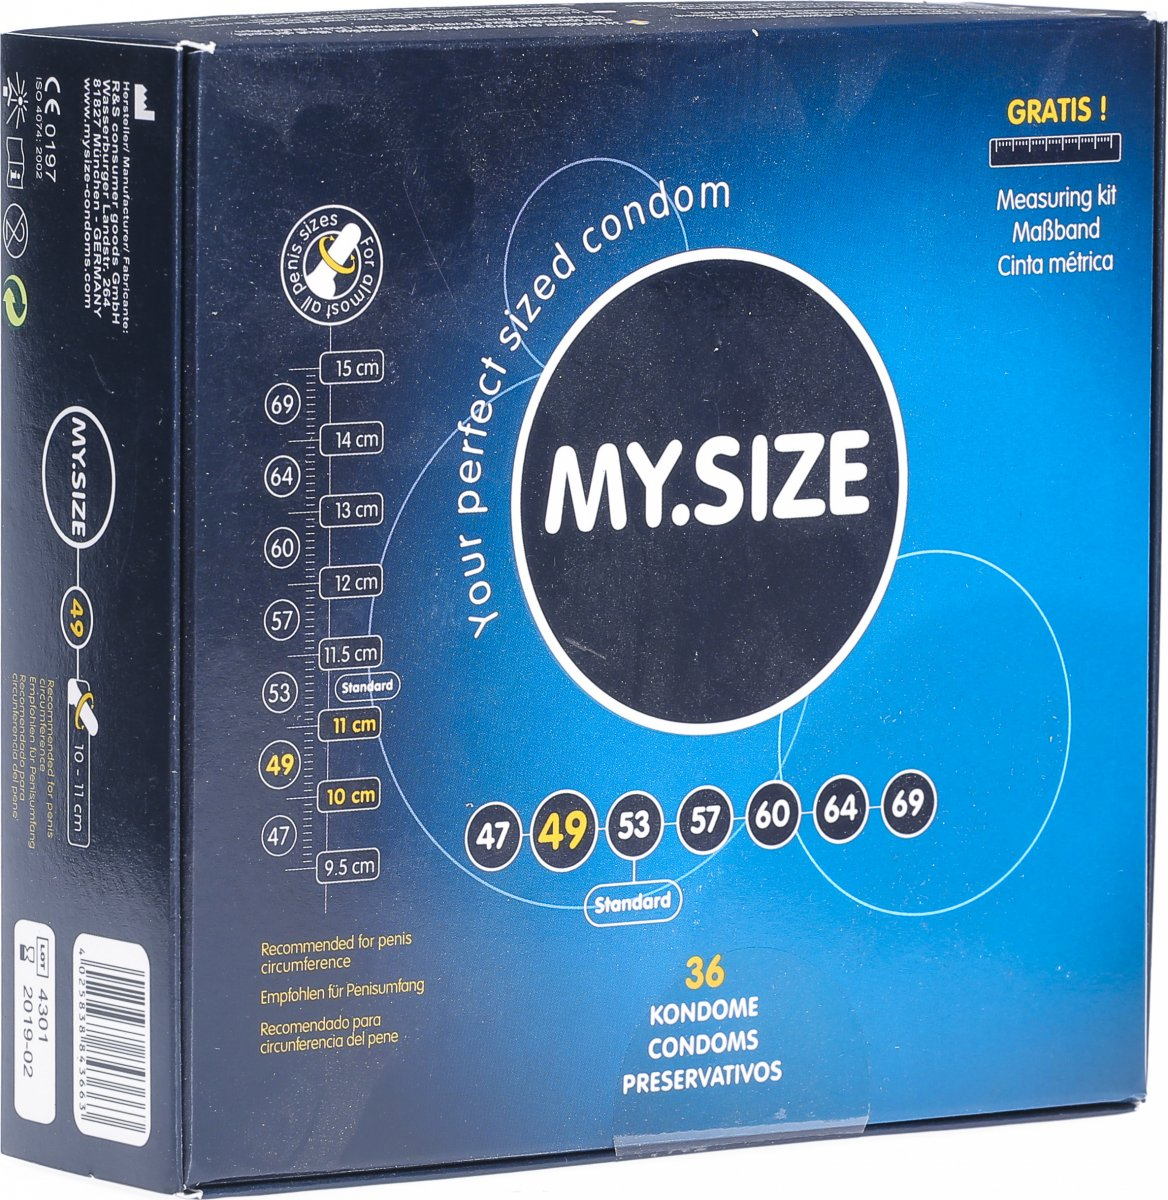 size kondom